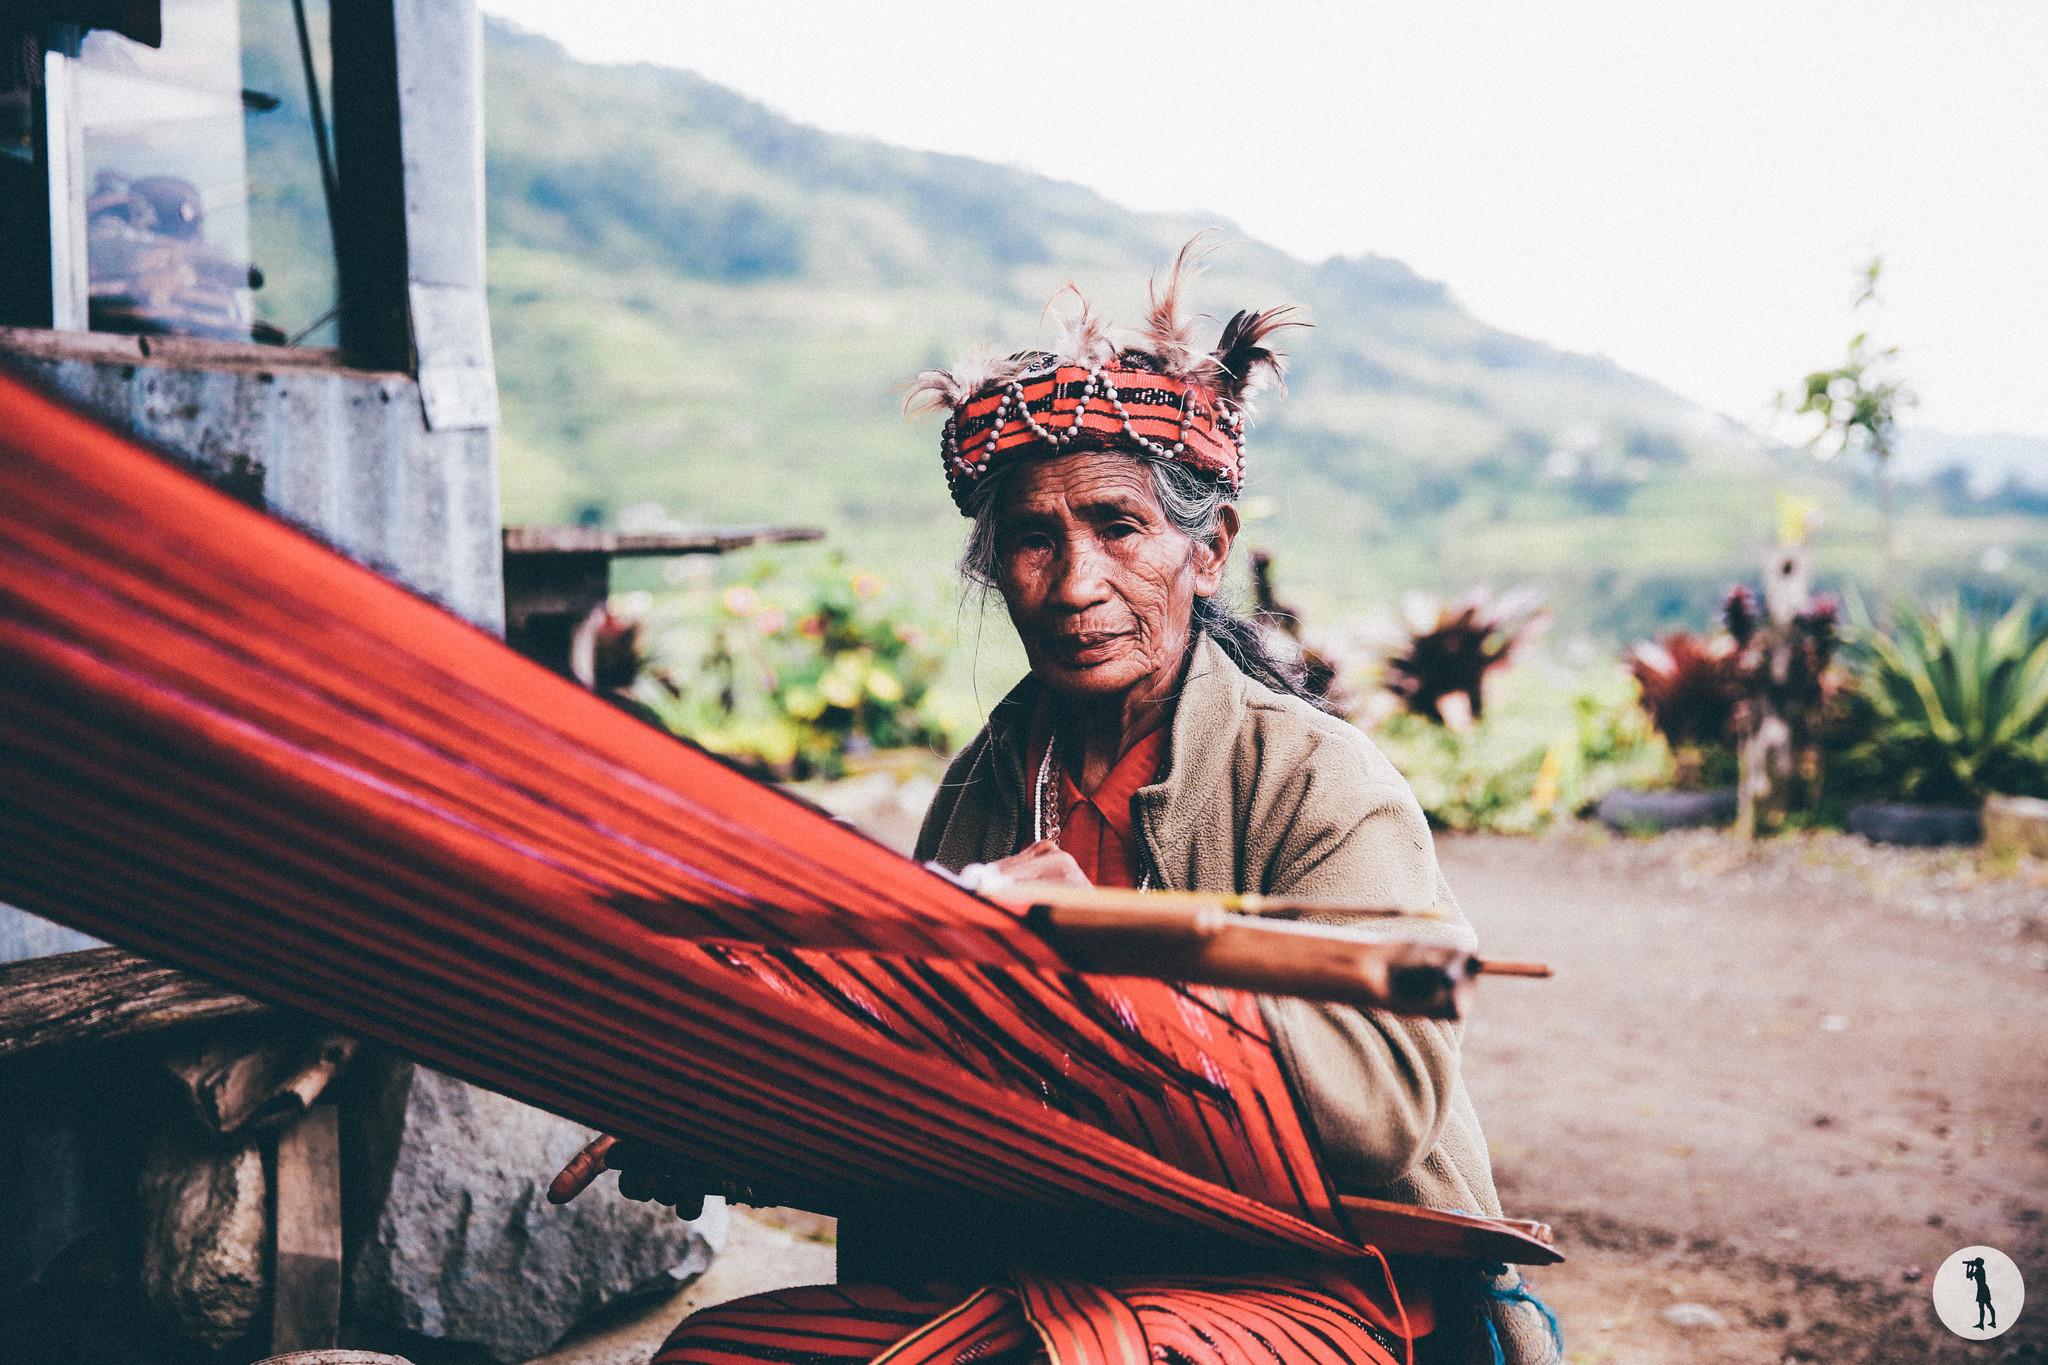 Travel to the Philippines - Banaue